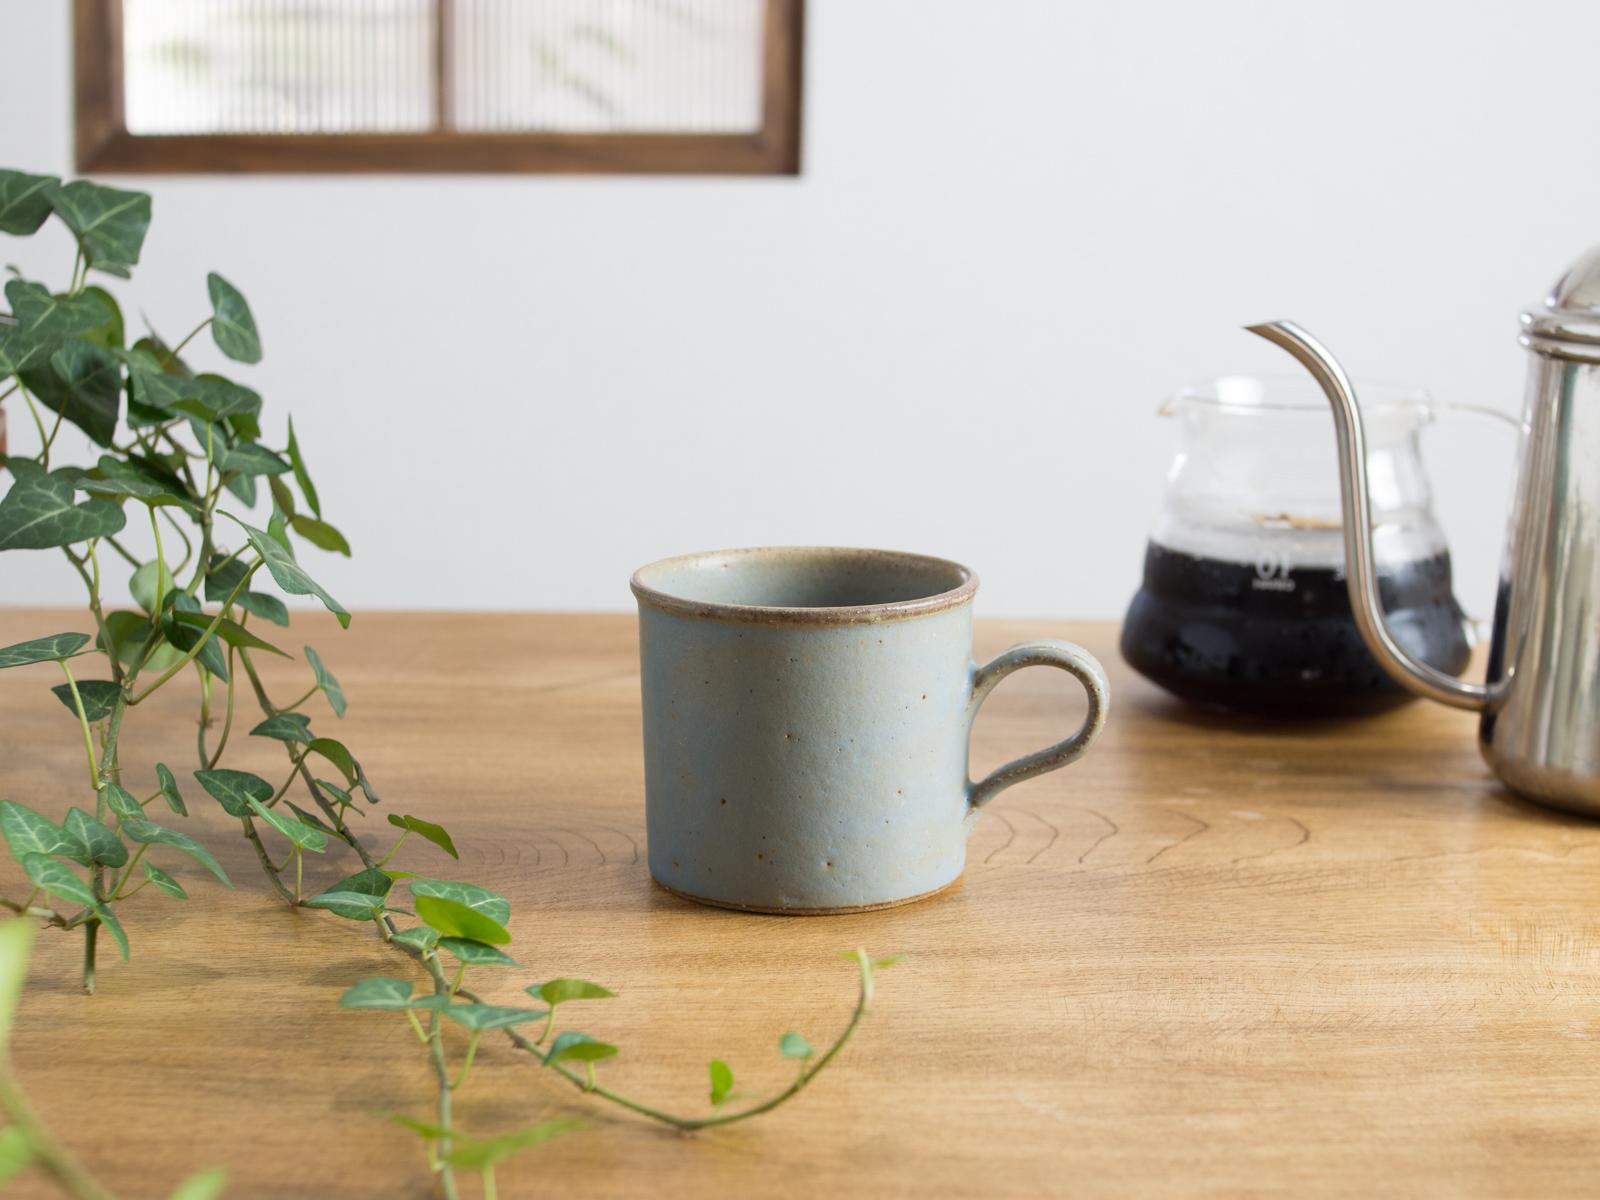 SHIROUMA コーヒーカップ 灰色(マグカップ)/長谷川 哲也